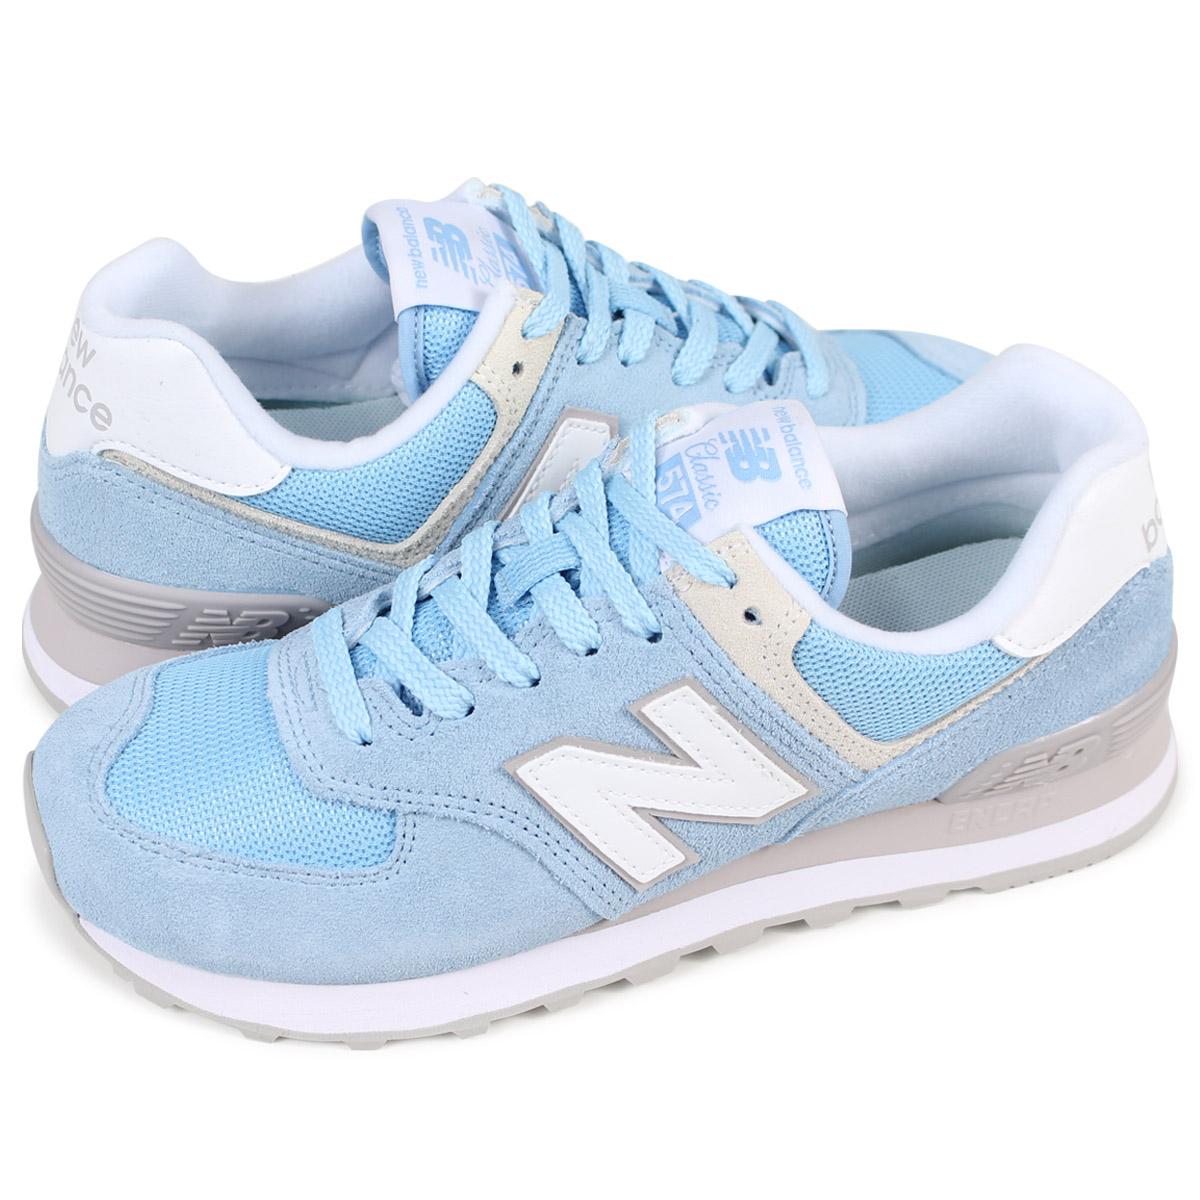 574 blue new balance